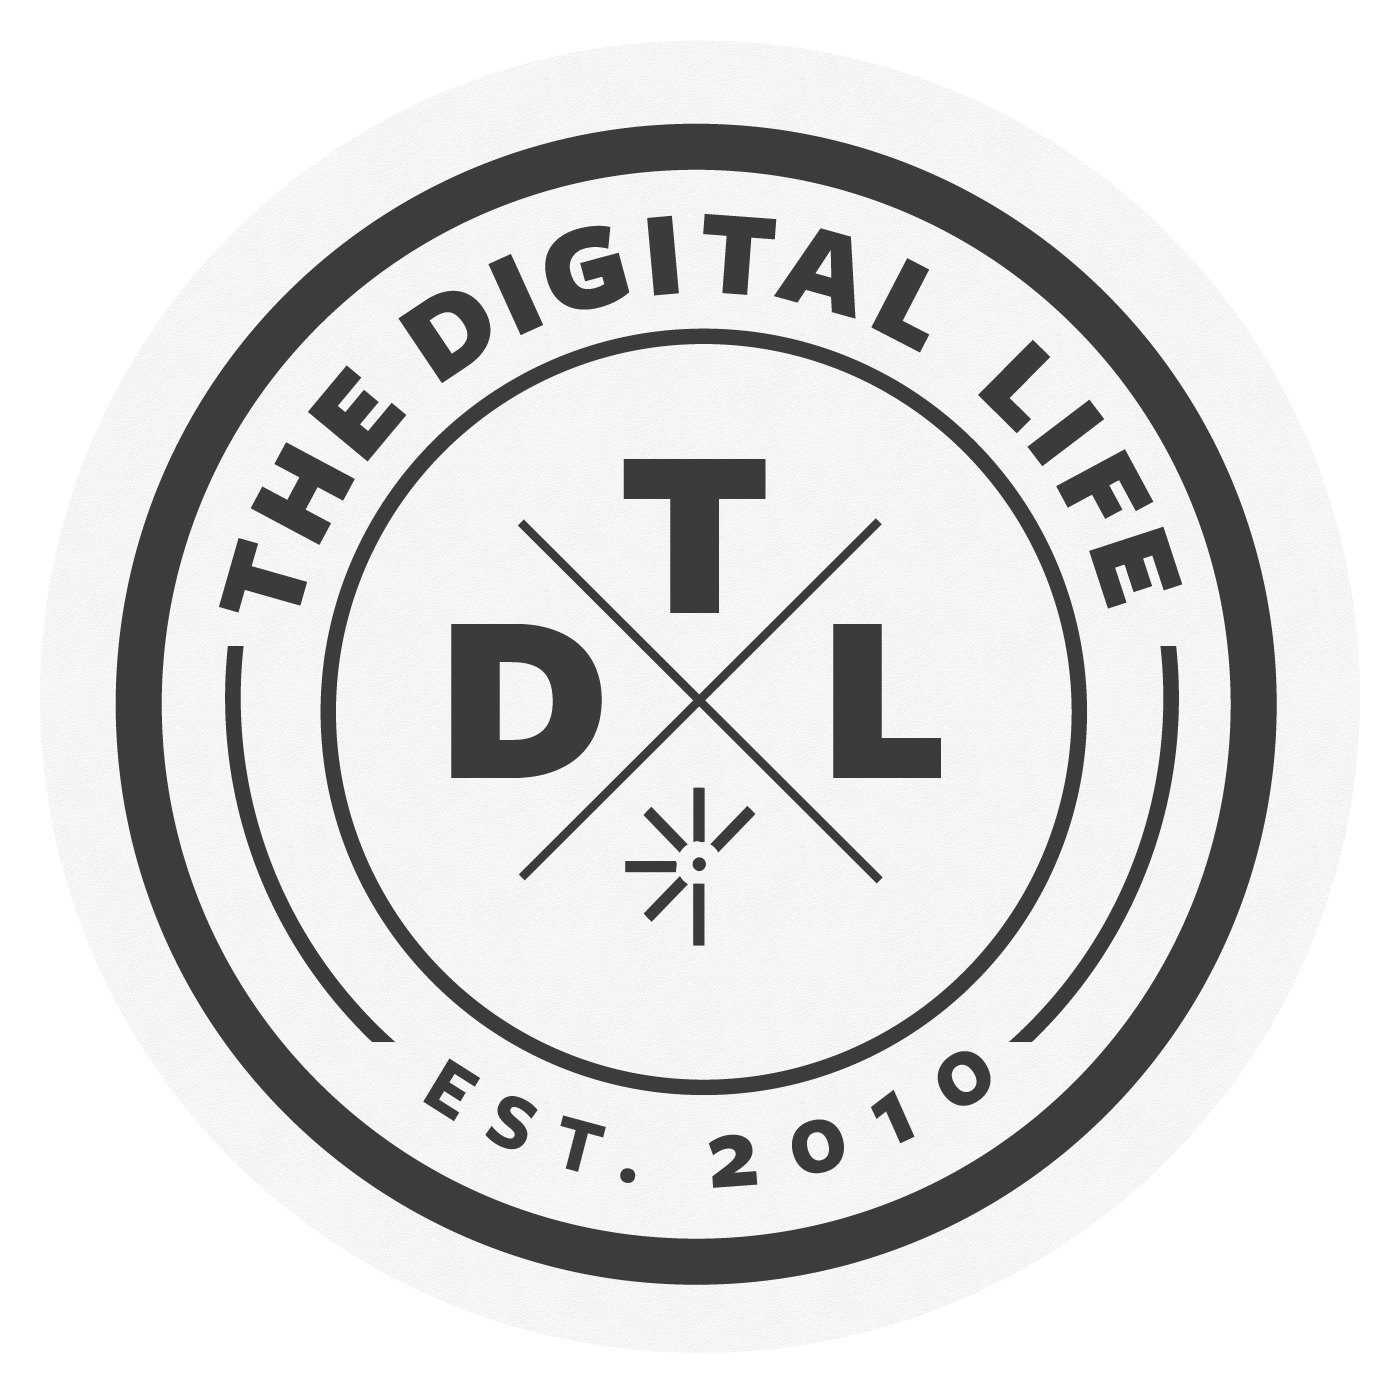 The Digital Life